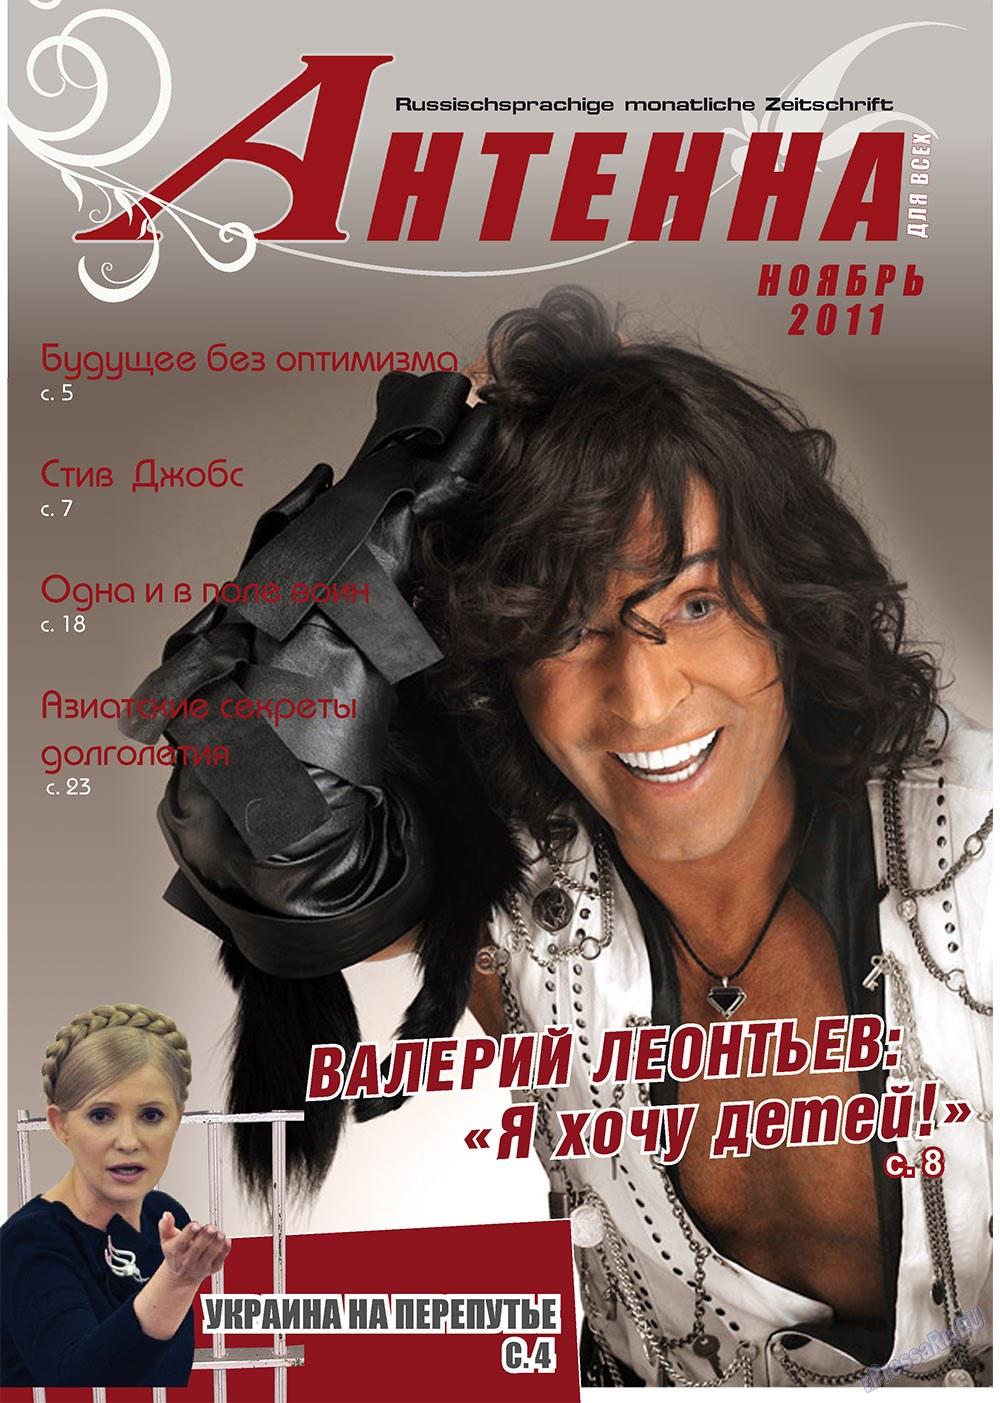 Антенна (журнал). 2011 год, номер 11, стр. 1